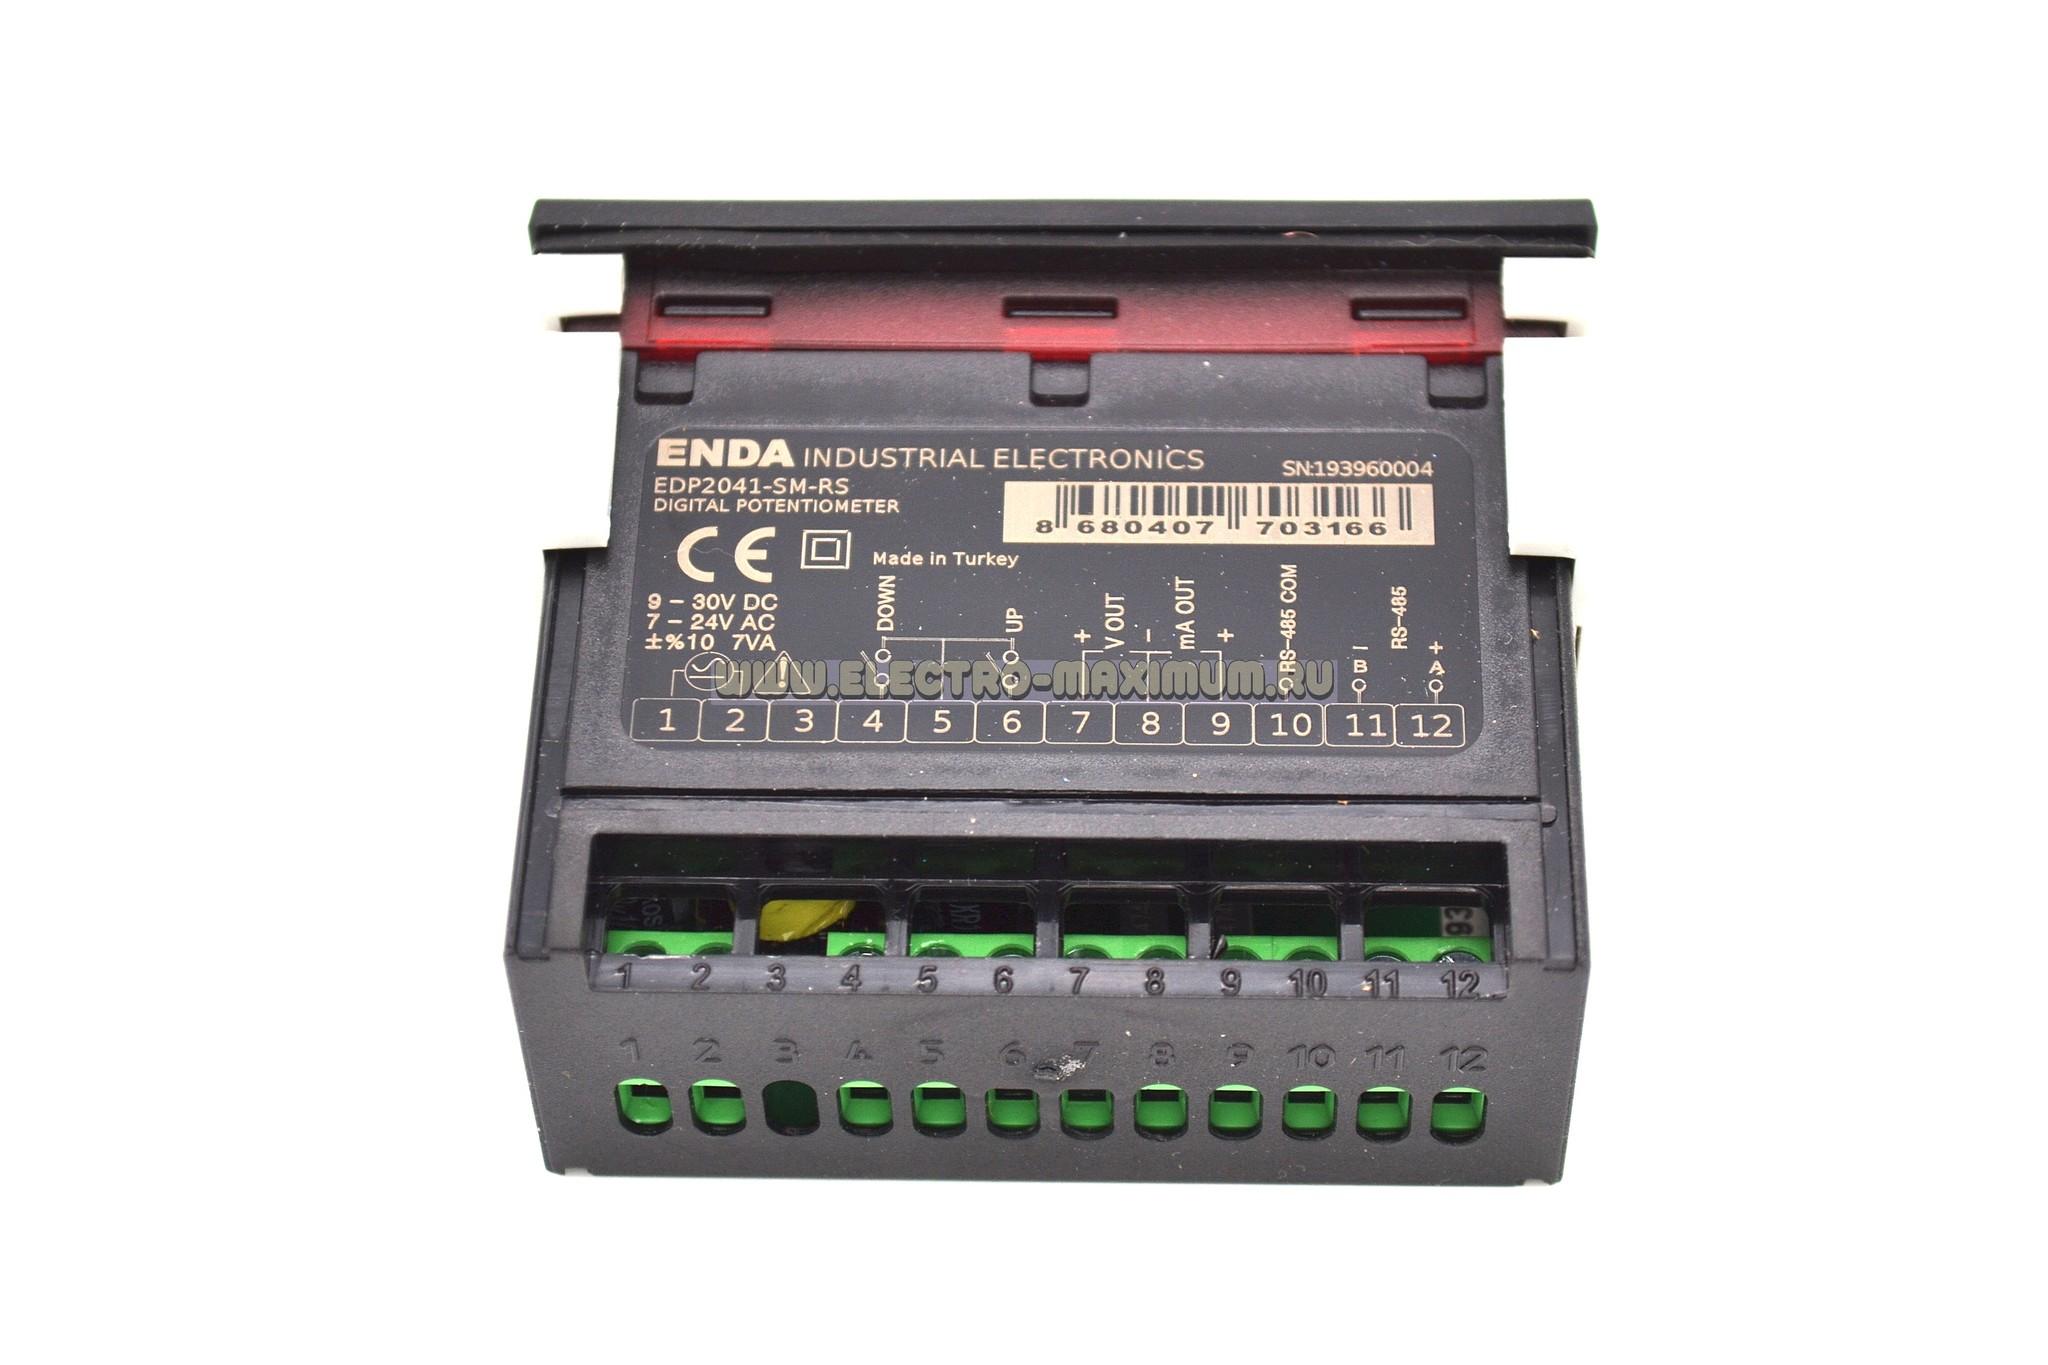 EDP2041-SM-RS